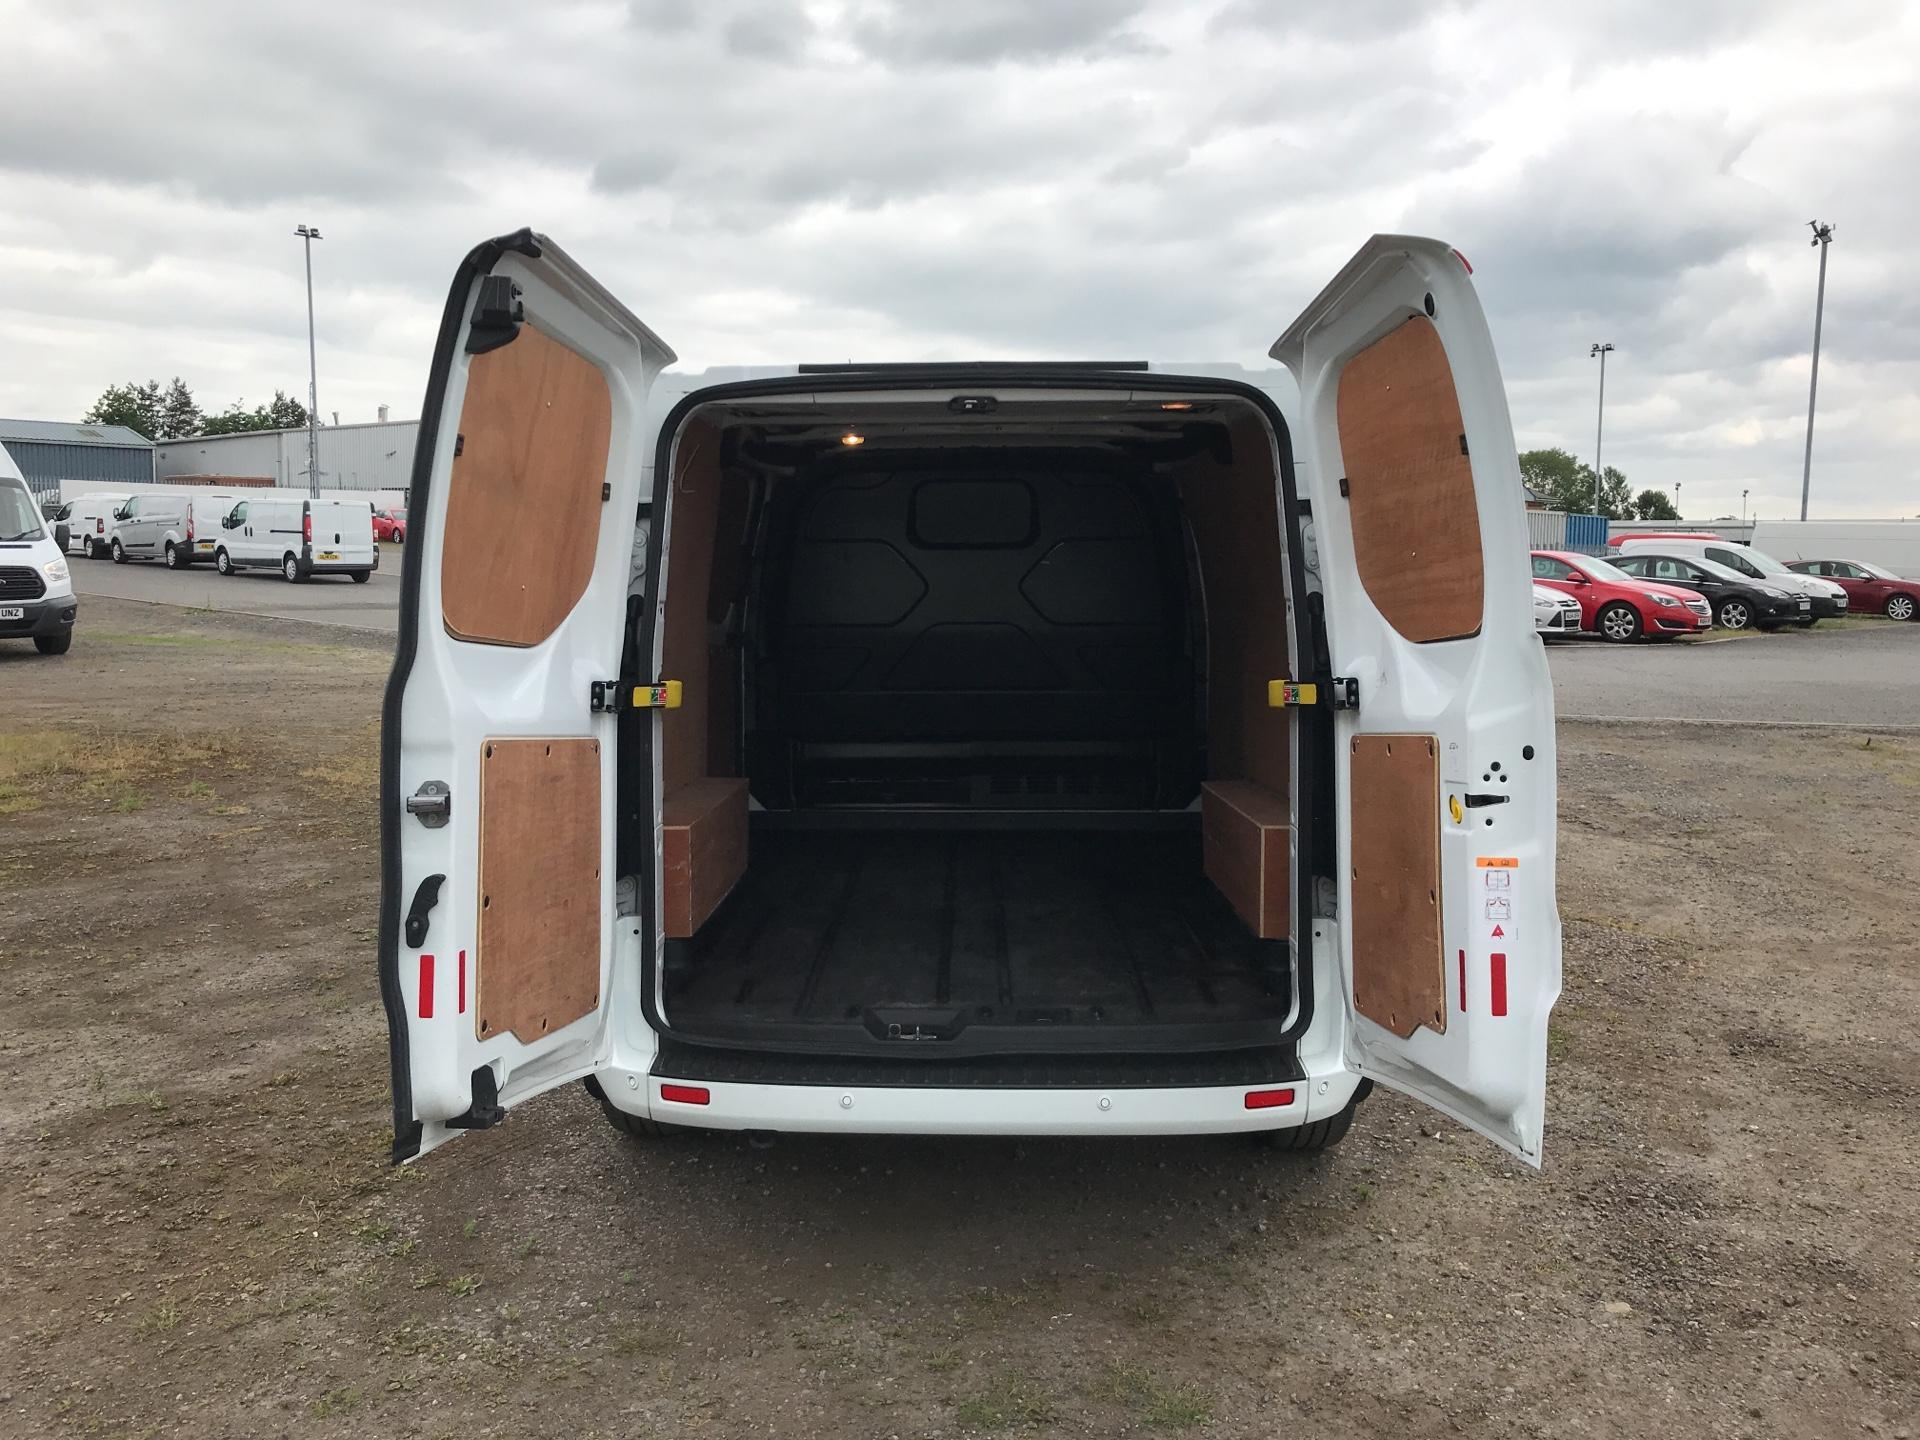 2016 Ford Transit Custom 290 L1 DIESEL FWD 2.2 TDCI 125 PS LOW ROOF LIMITED VAN EURO 5 (MK16WXV) Image 18